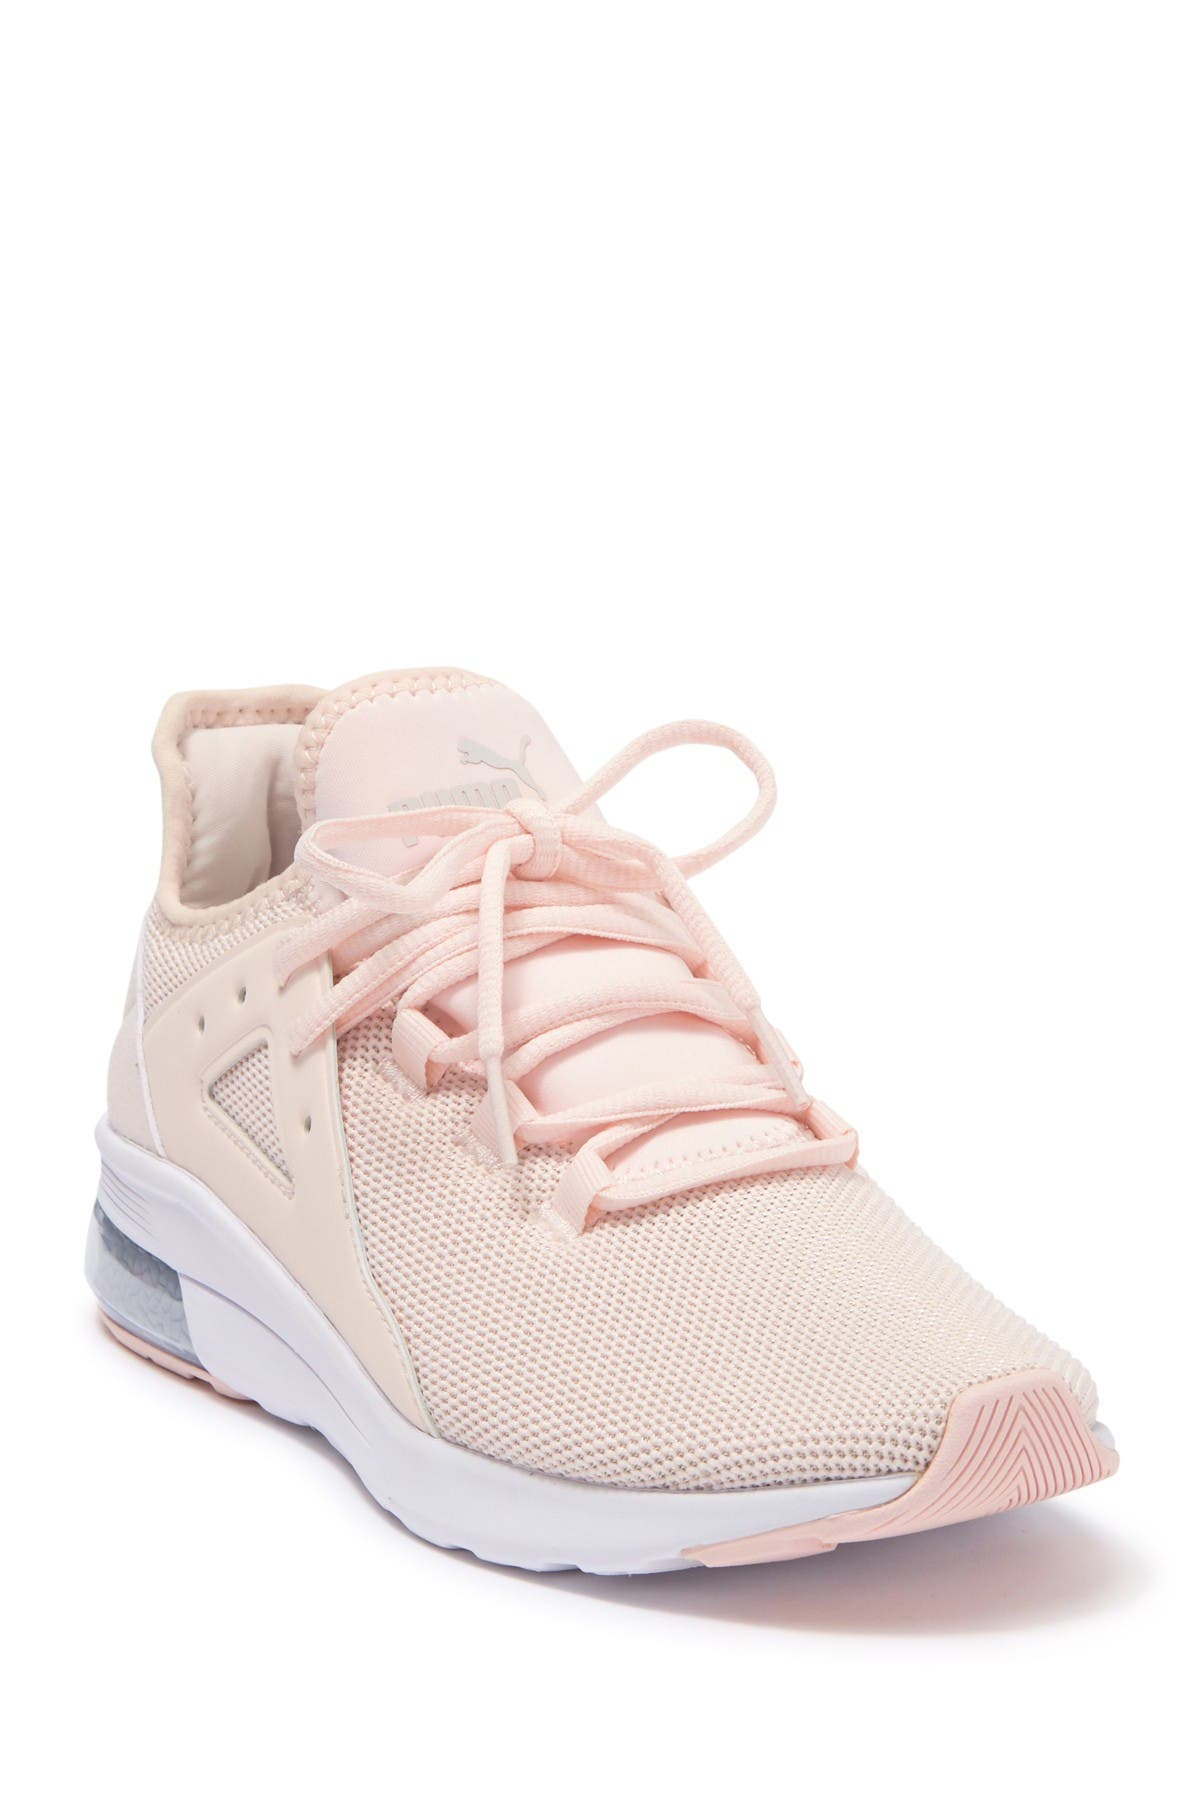 PUMA | Electron Street Knit Sneaker